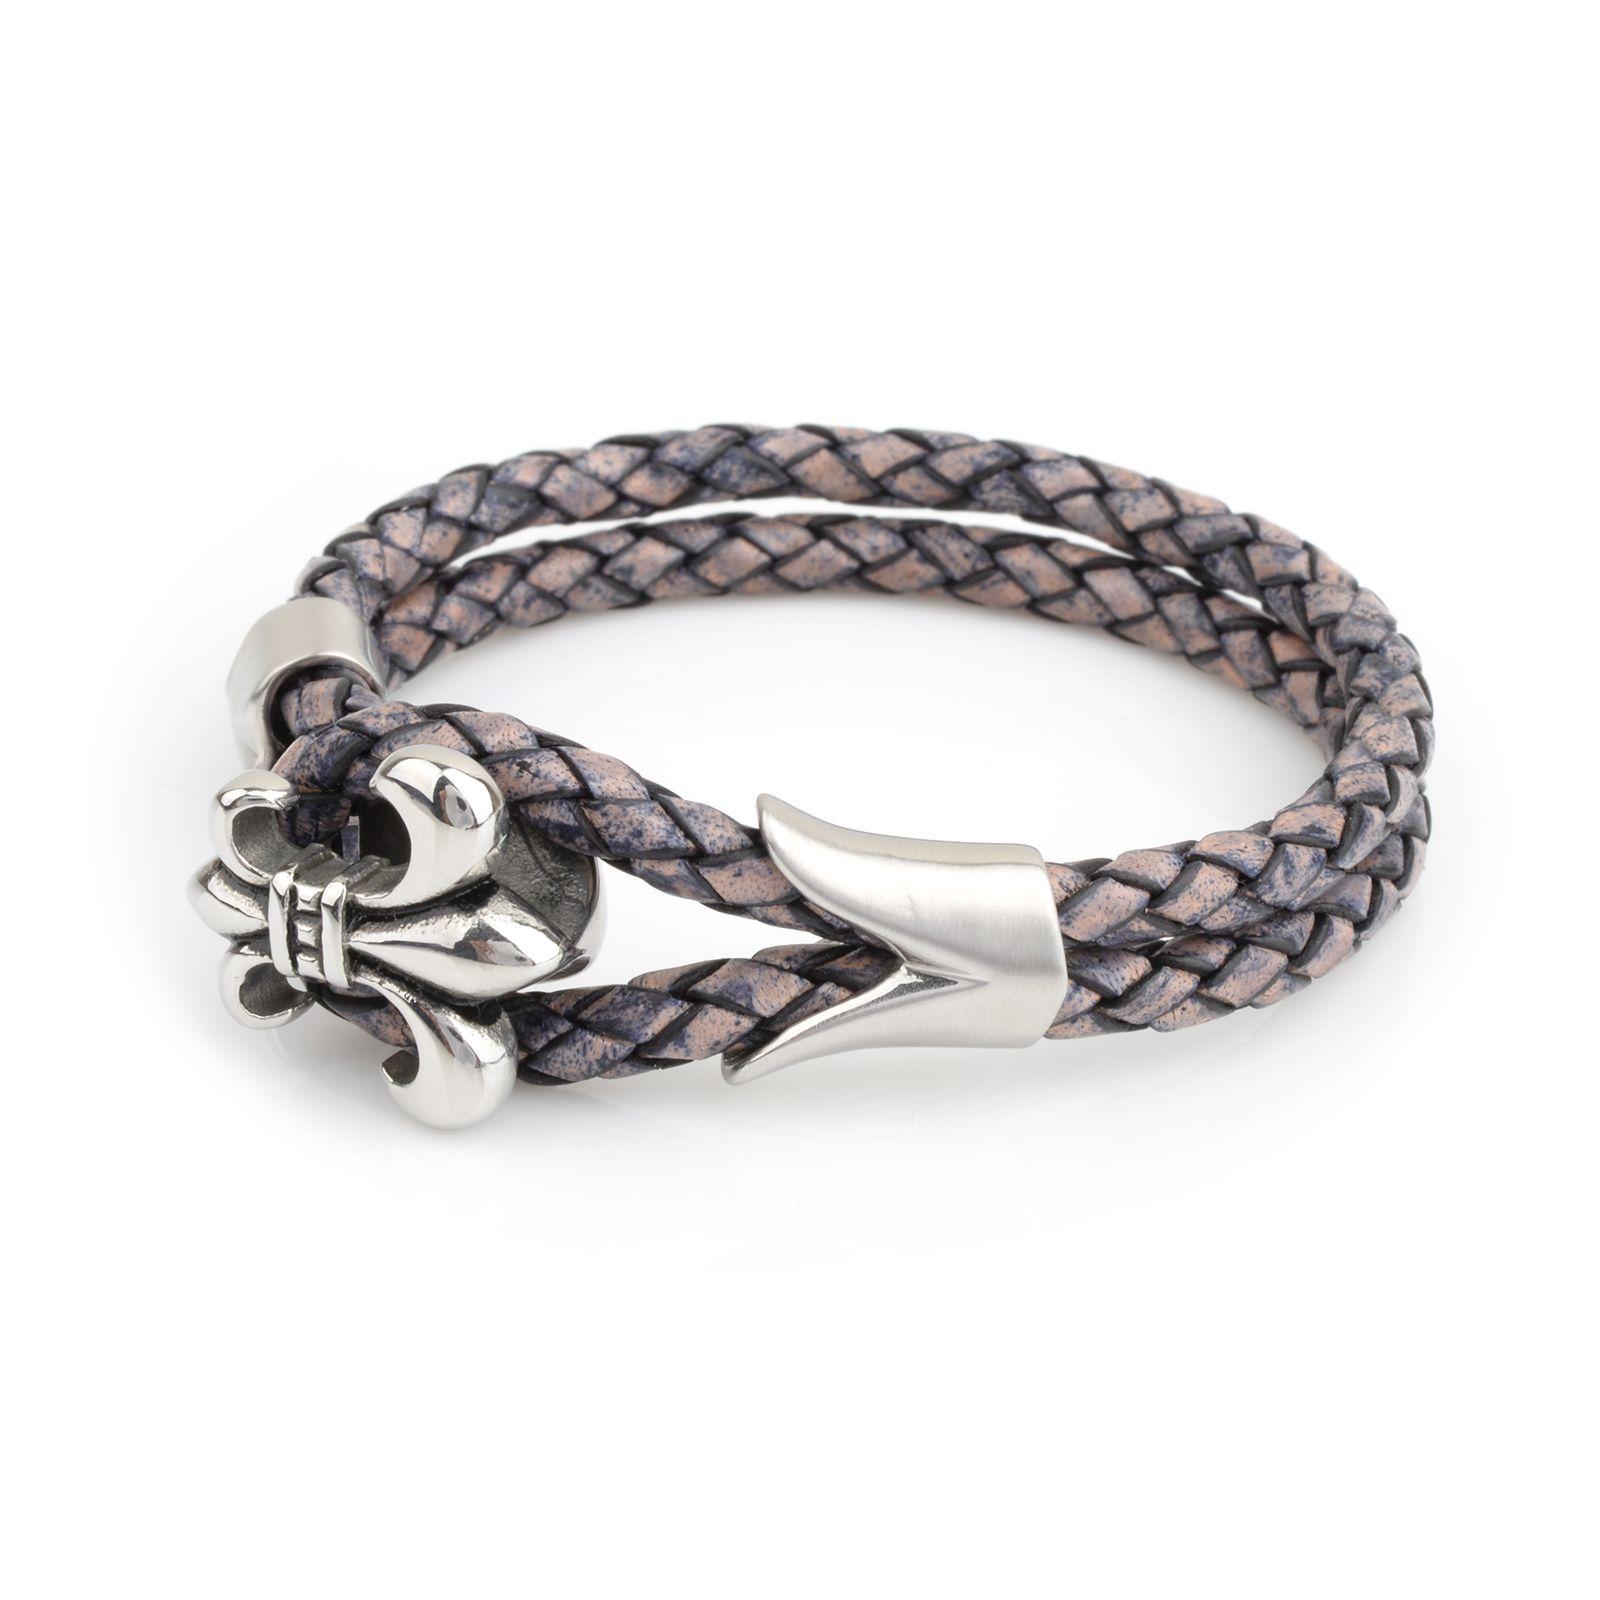 Fine Jewelry Mens Stainless Steel & Black Leather Antiqued Fleur De Lis Bracelet lvsqNHK